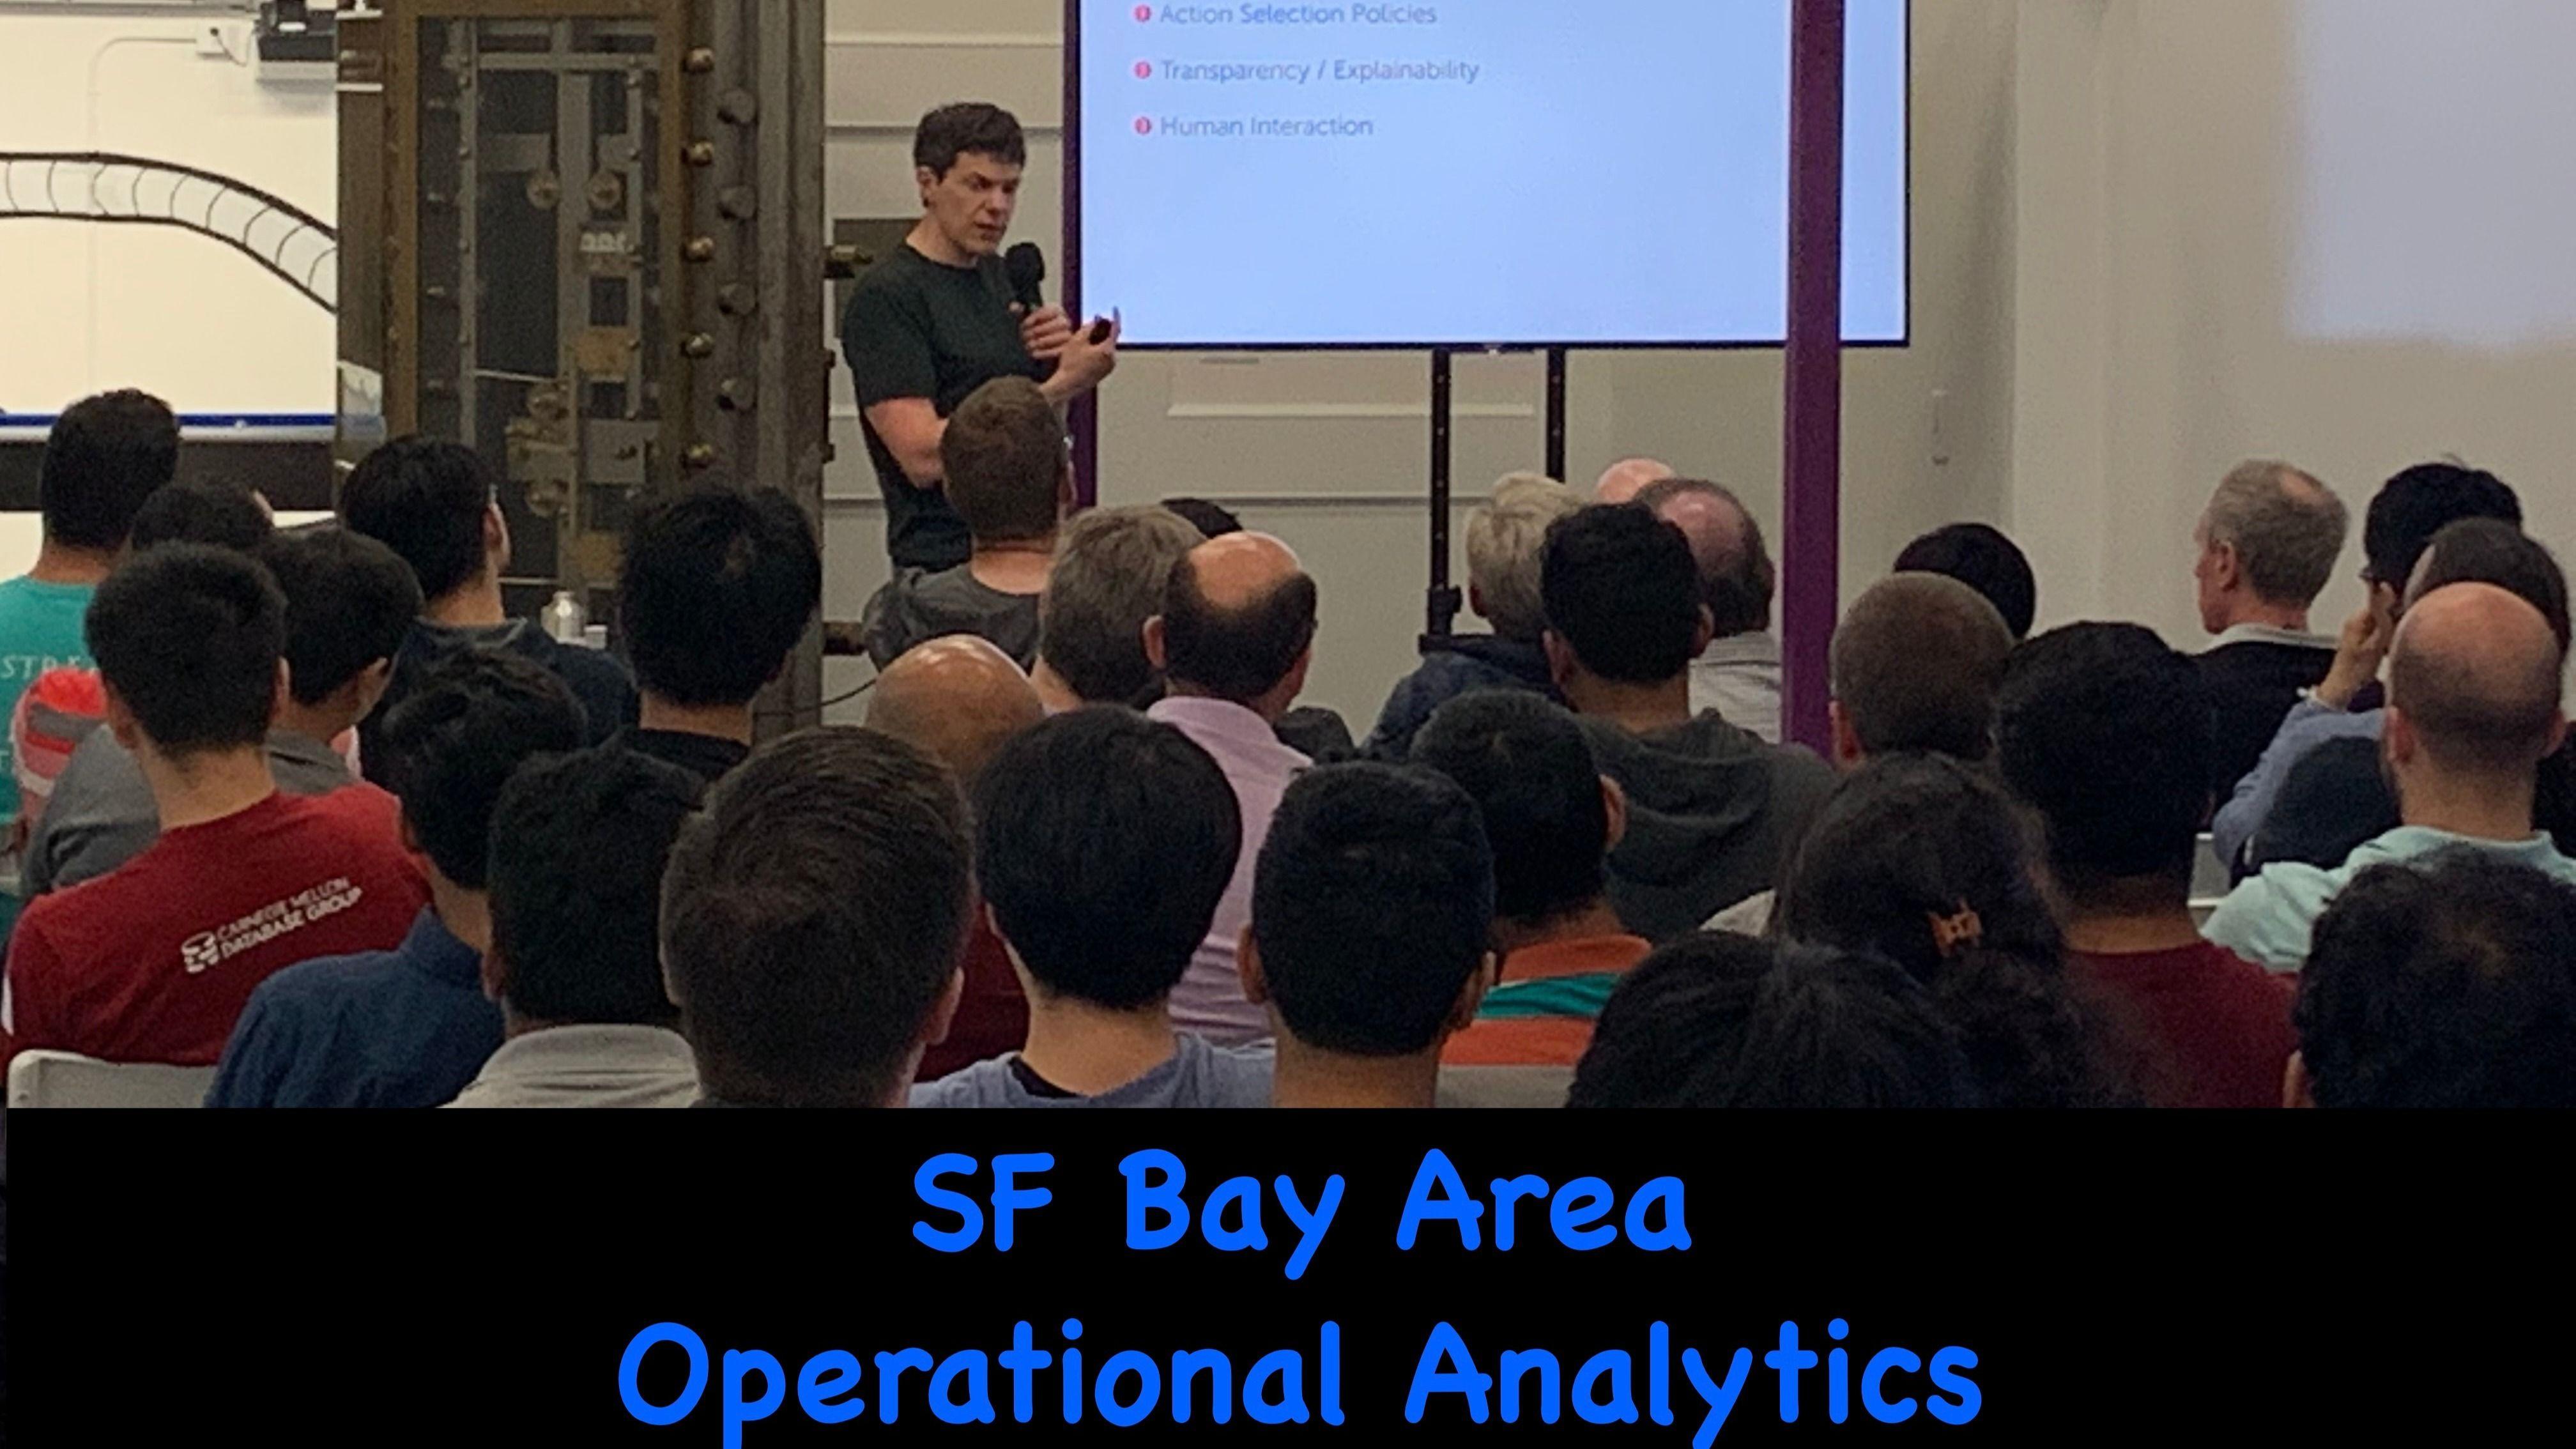 SF Bay Area Operational Analytics